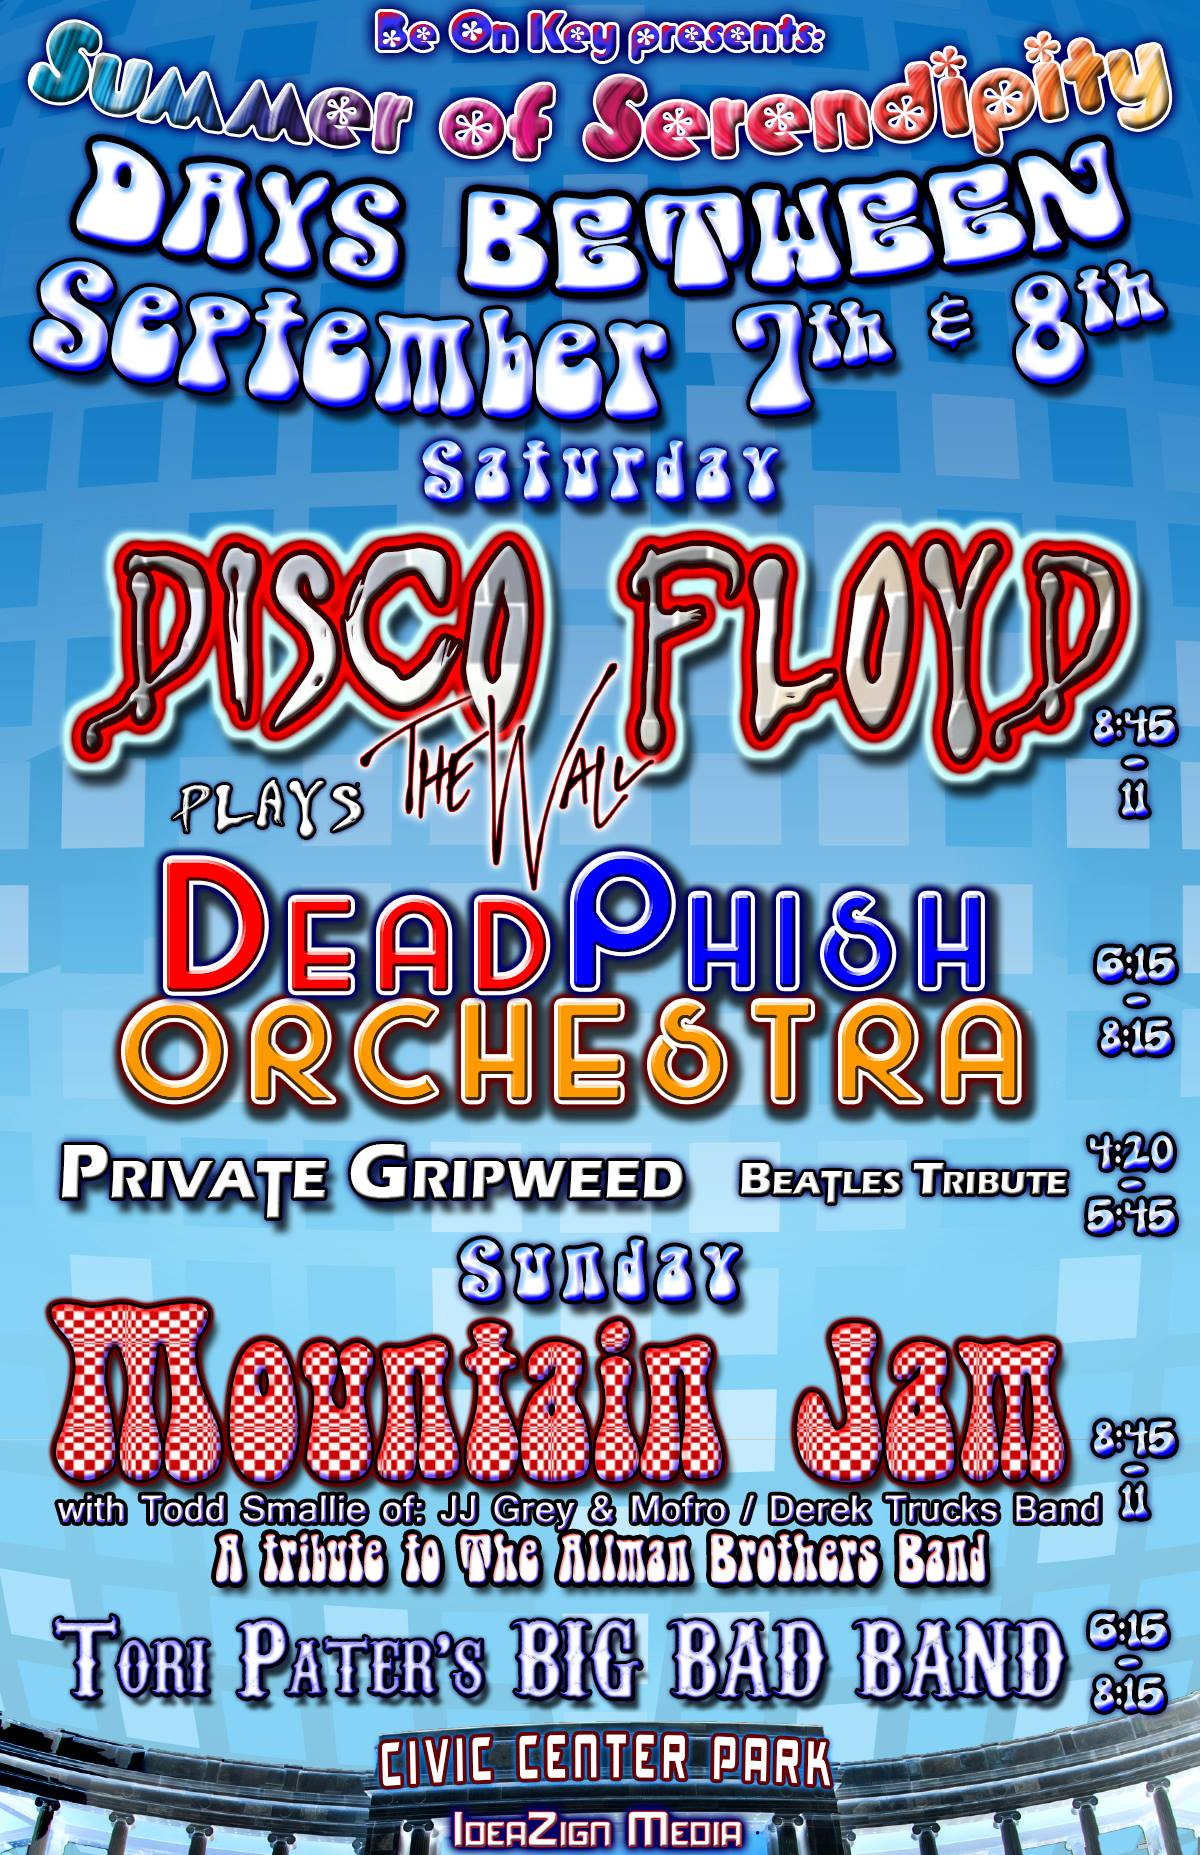 AllmanBrothersTribute_MountainJam2013-09-08GreekTheaterDenverCO.jpg